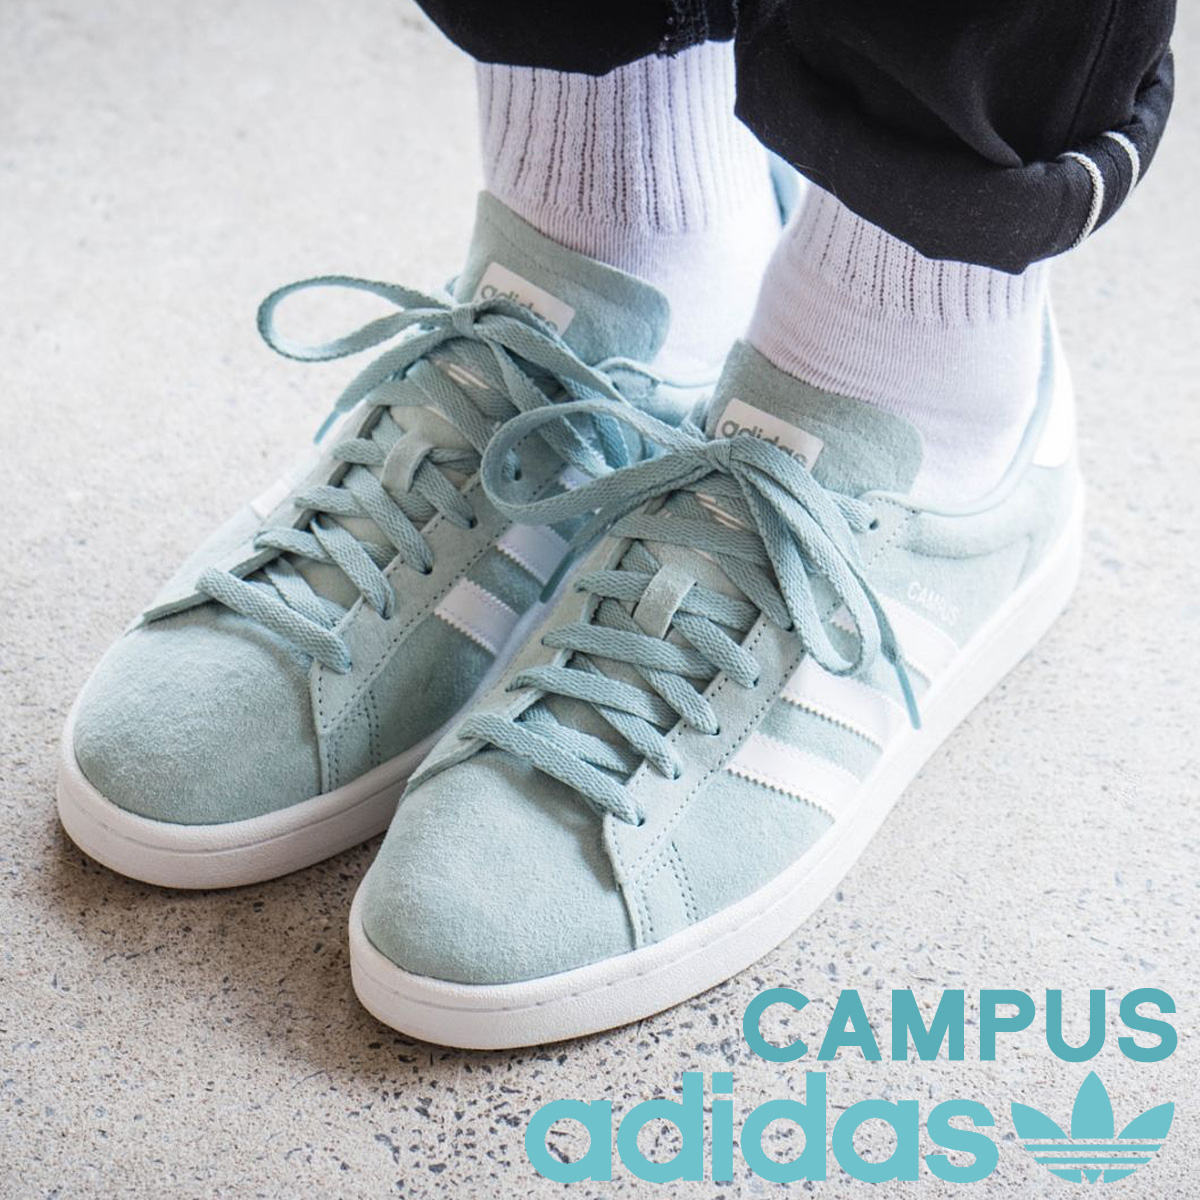 10cc4305f093 adidas originals Adidas campus sneakers CAMPUS men gap Dis BZ0082 shoes  emerald green  7 12 Shinnyu load